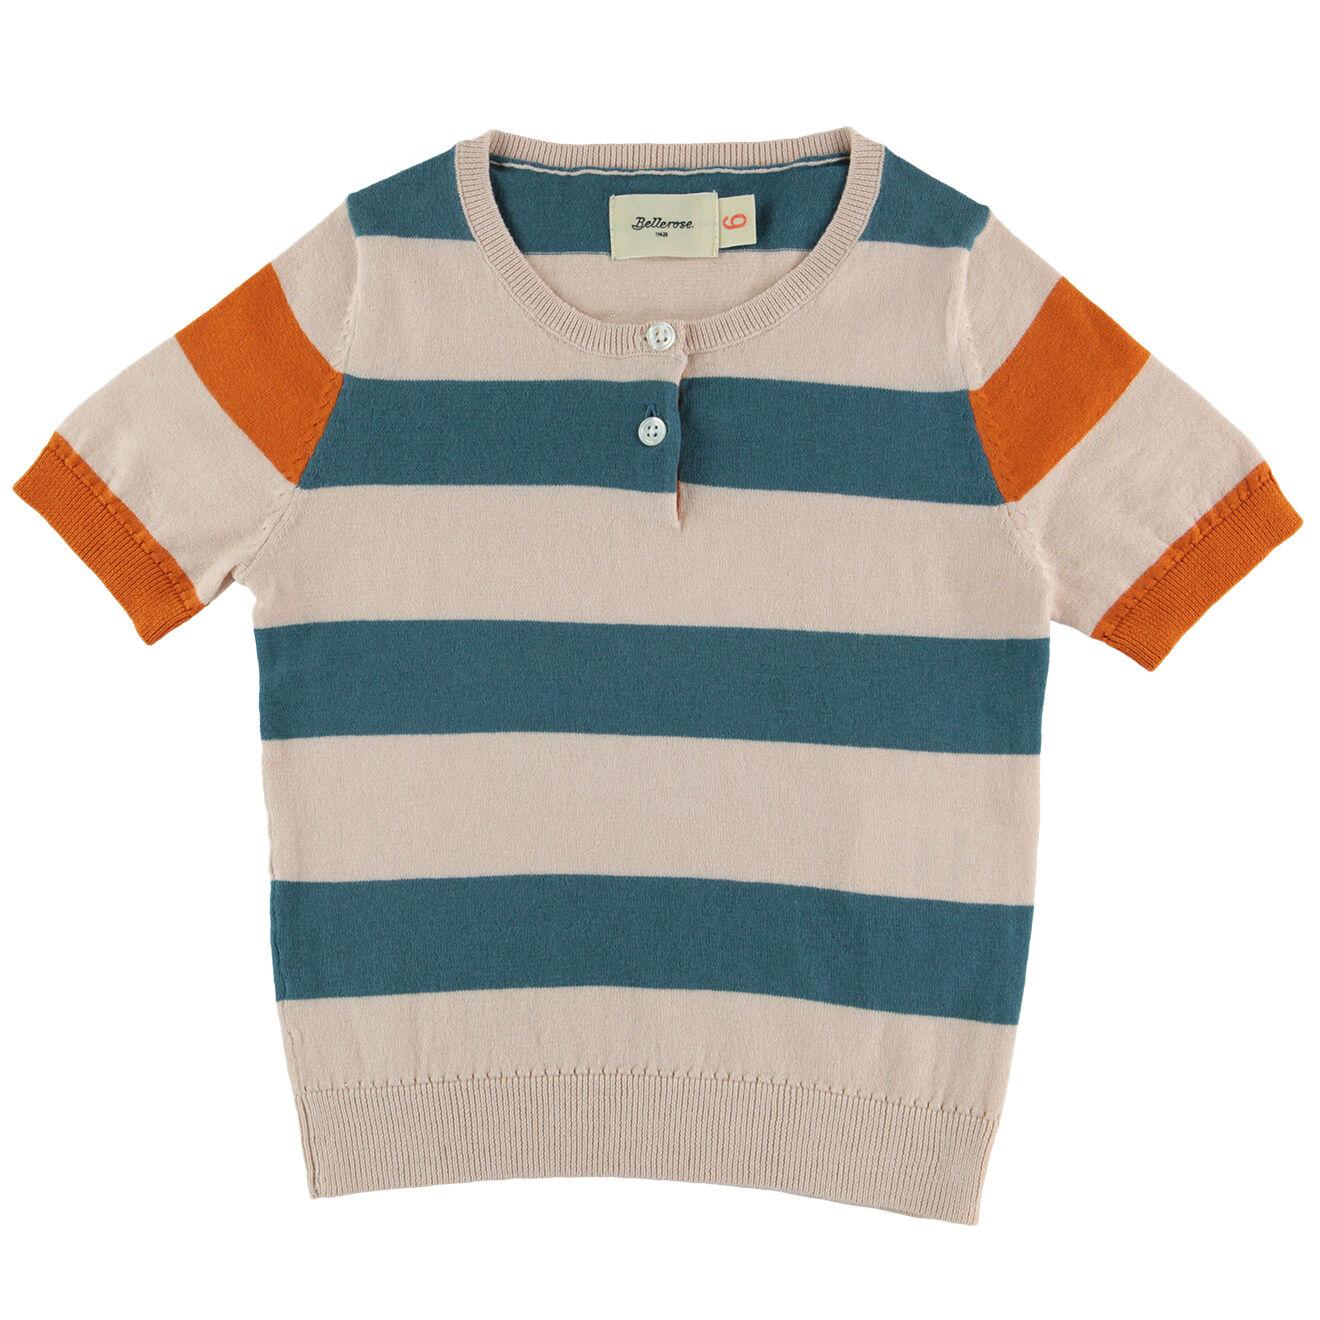 Pull en coton & laine calice ray� rose & vert